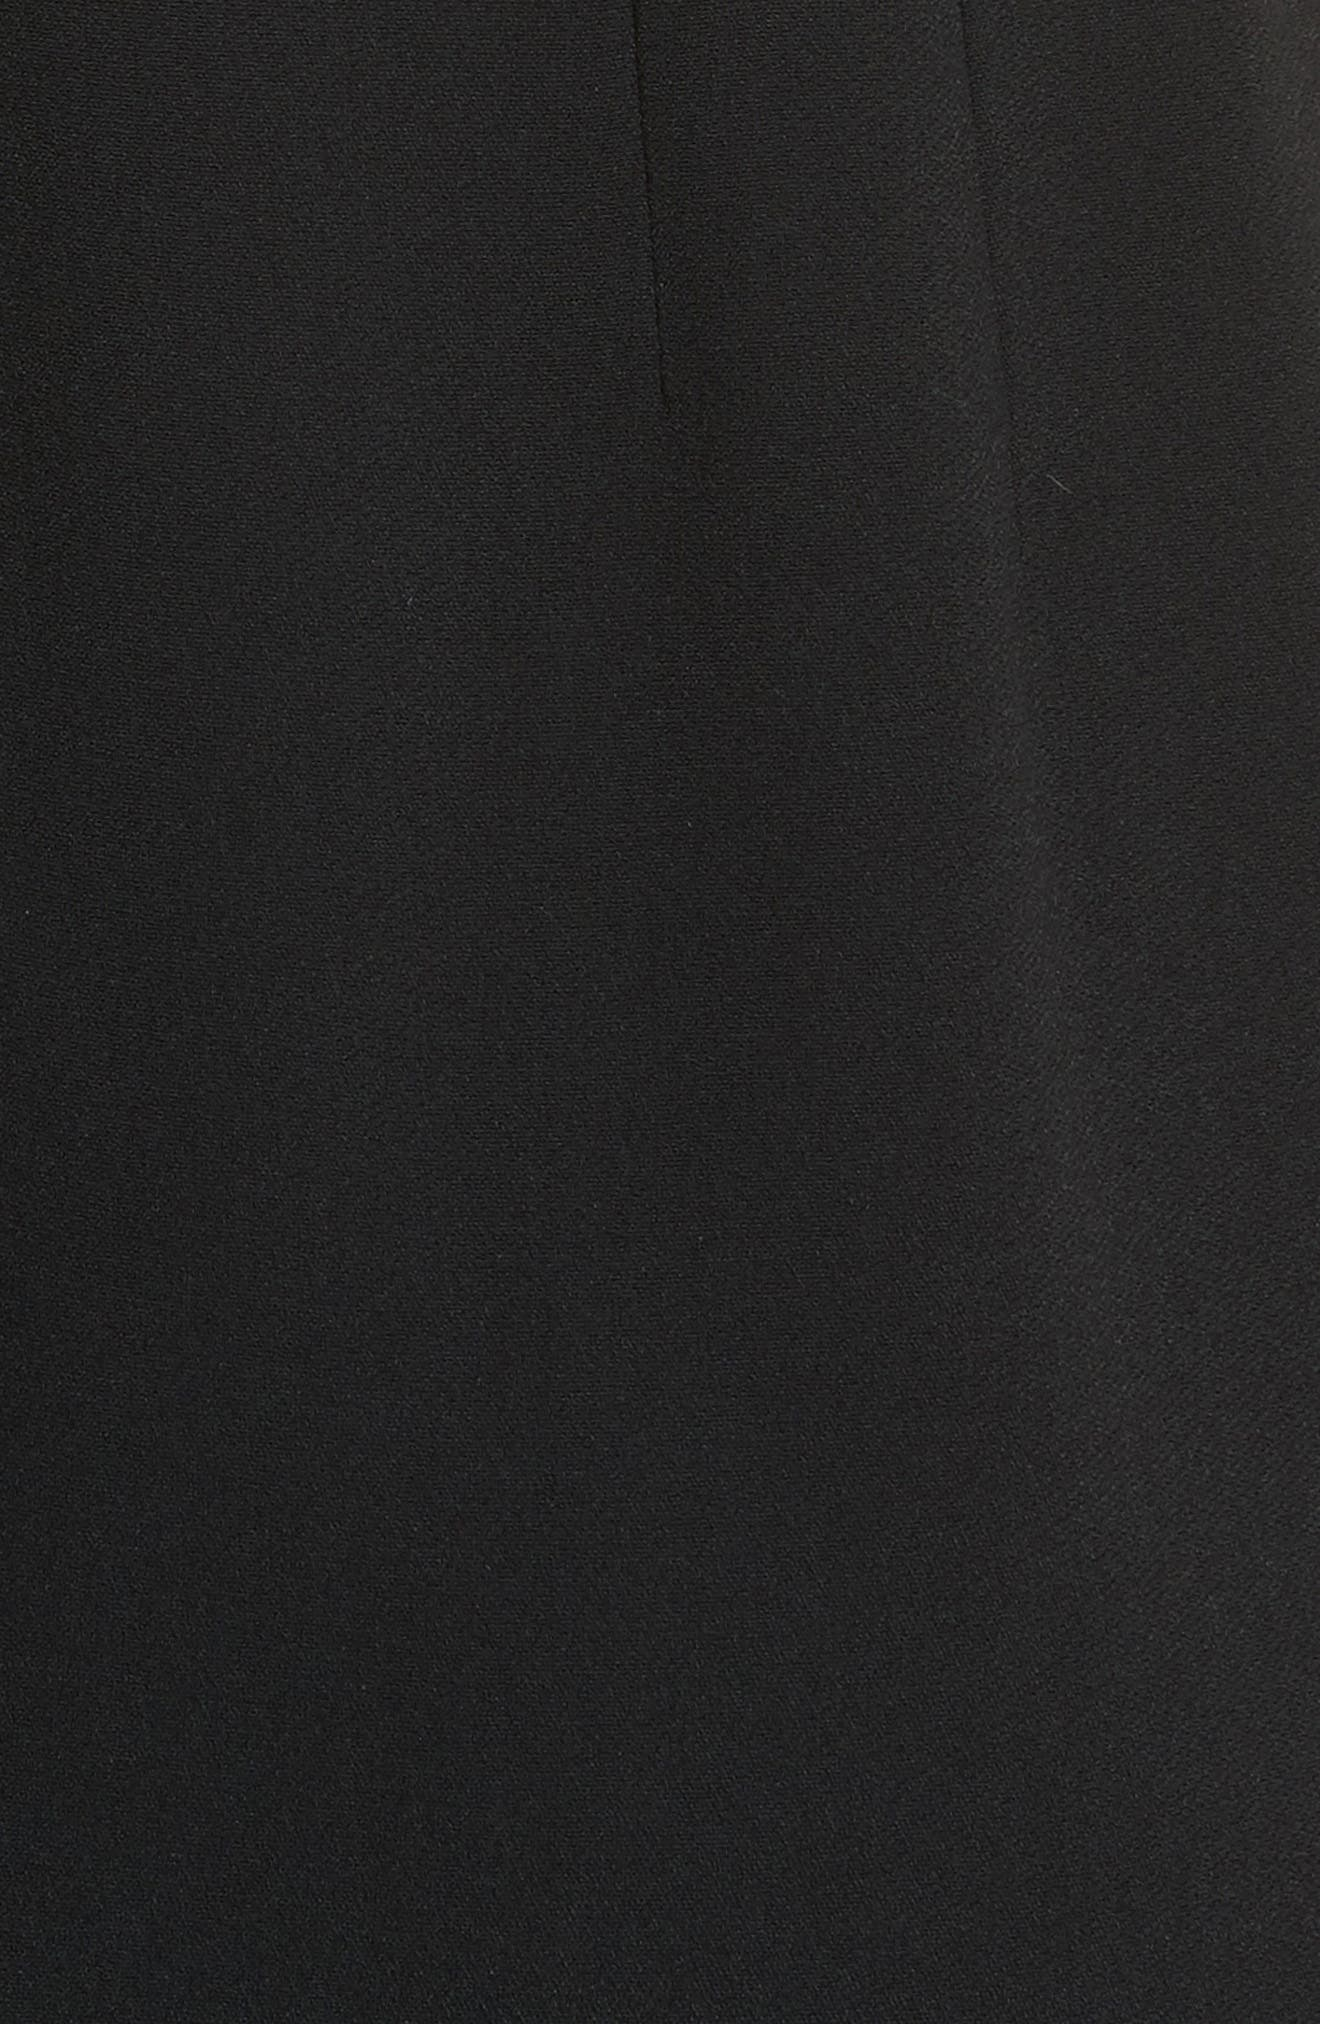 Stretch Cady Sheath Dress,                             Alternate thumbnail 5, color,                             Nero